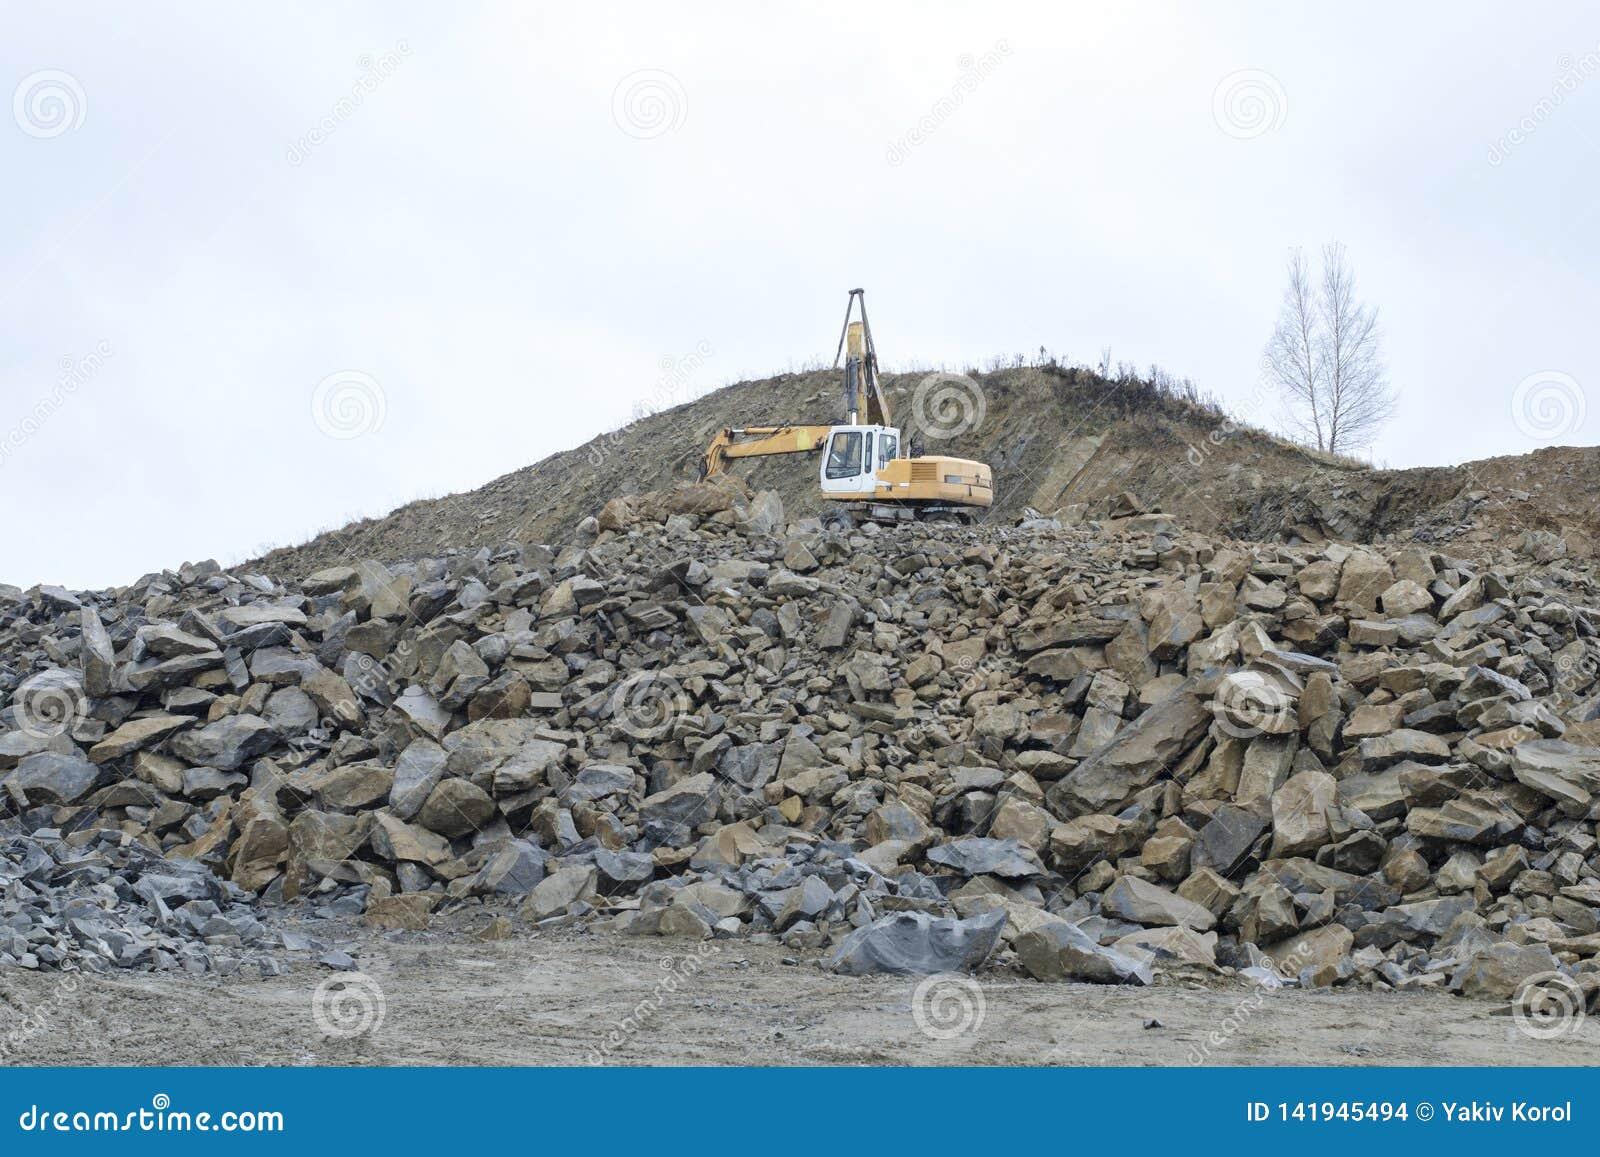 Excavator in an open pit mine